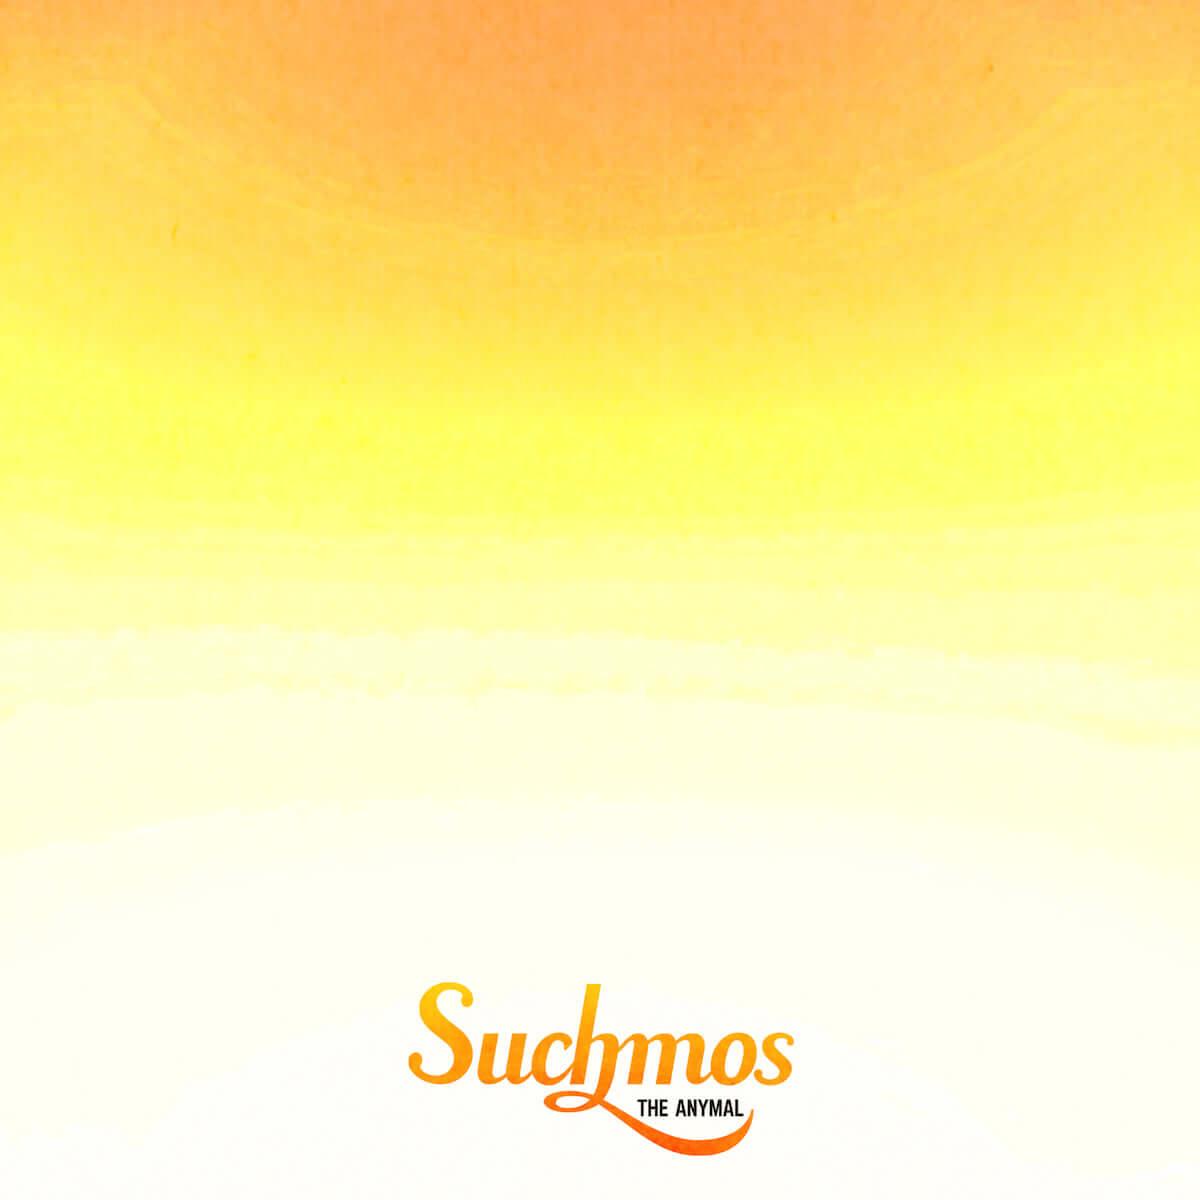 Suchmos、ニューアルバム『THE ANYMAL』の先行全曲試聴会を全国で一斉開催 music190227_suchmos_2-1200x1200